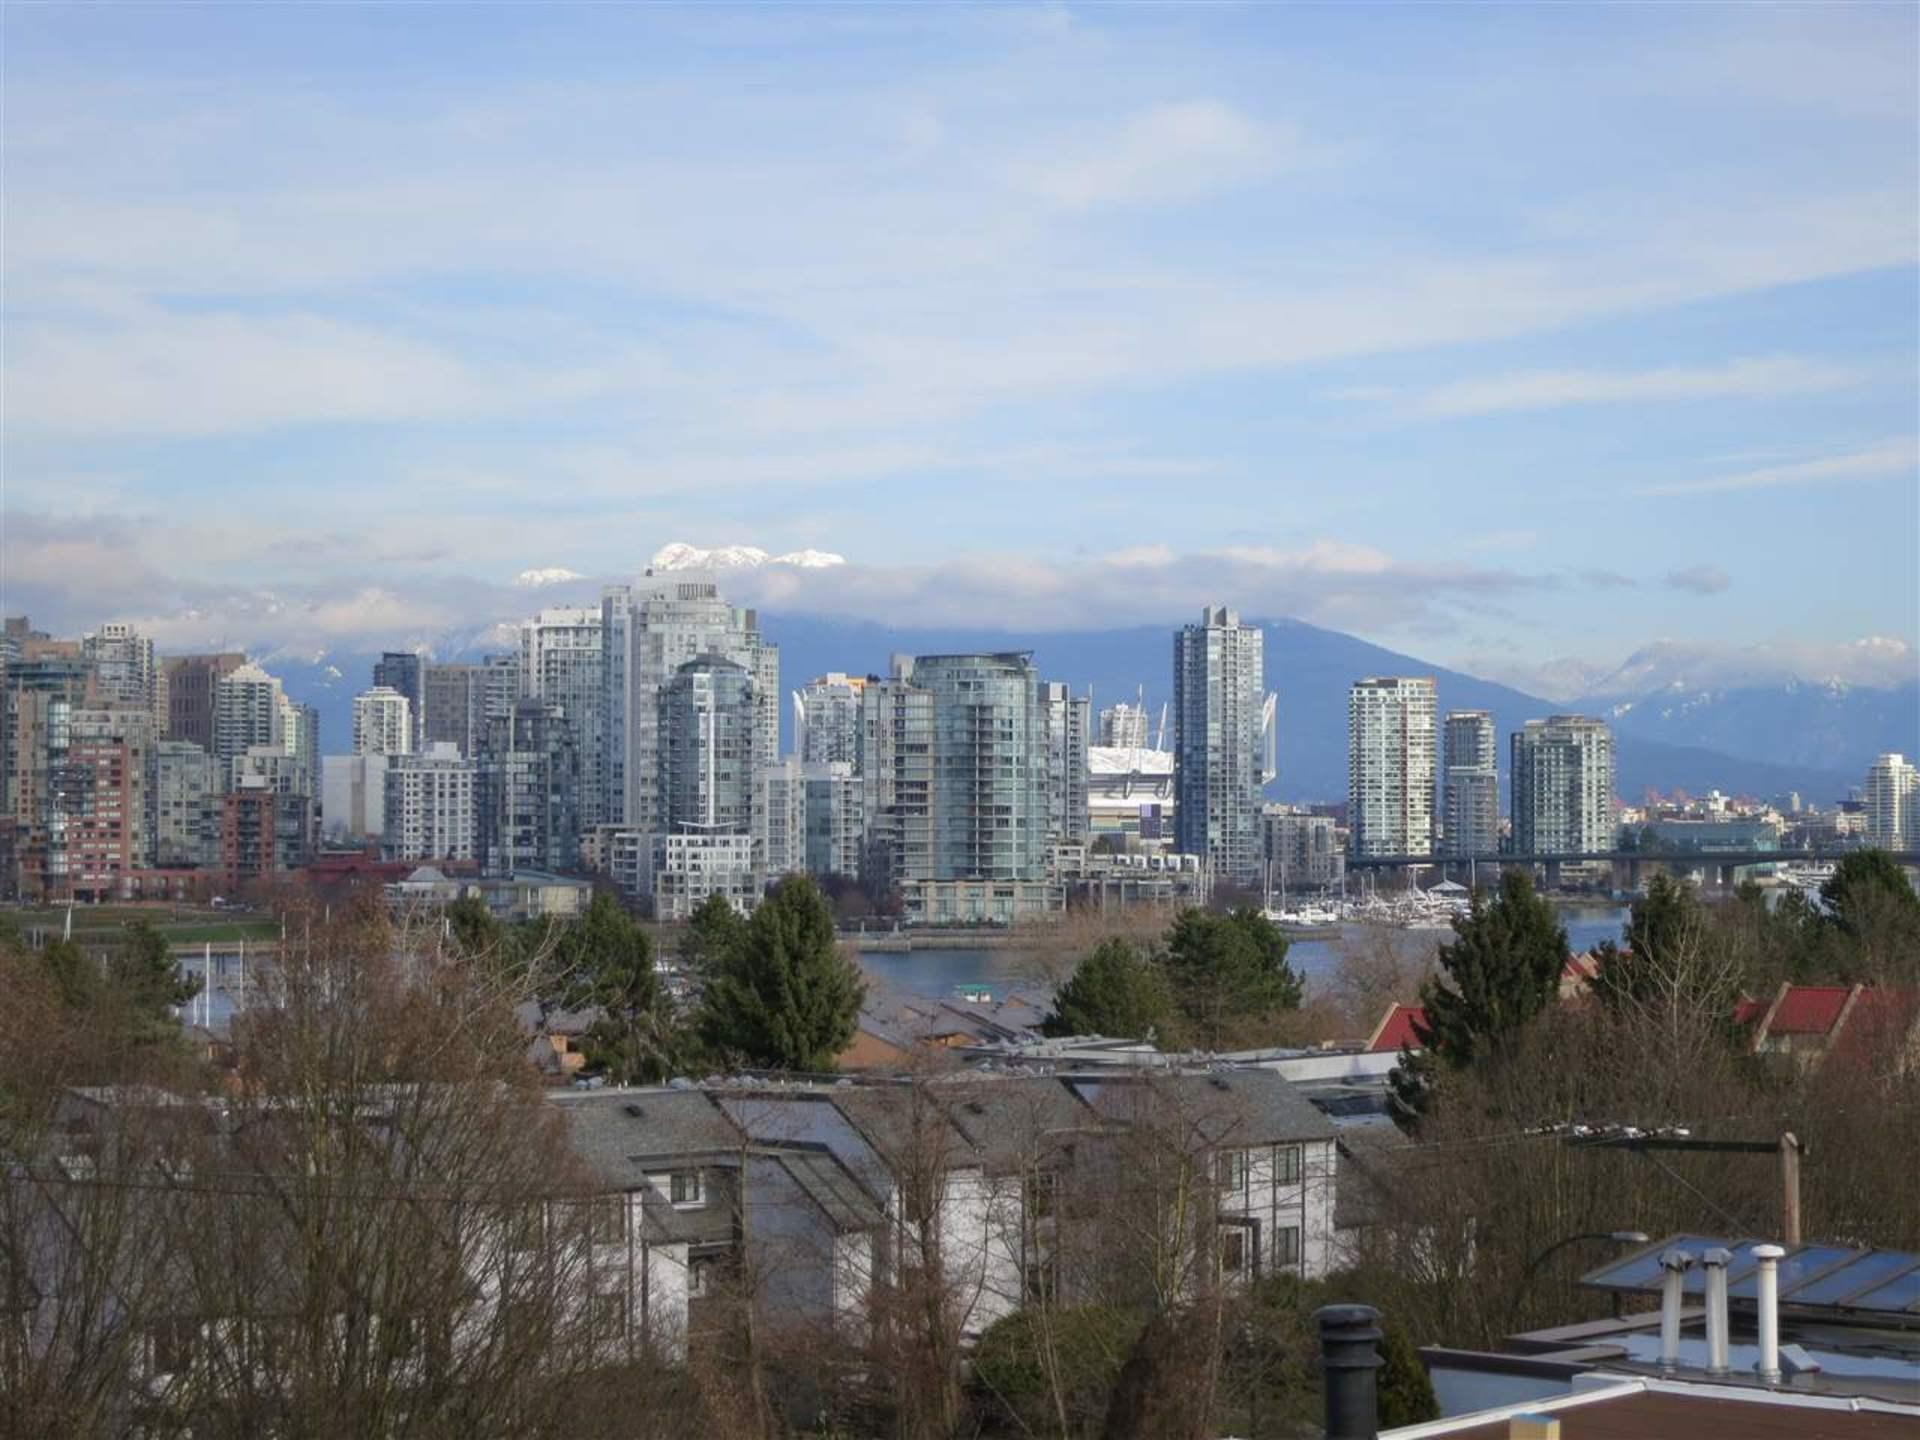 2228-alder-street-fairview-vw-vancouver-west-15 at 2208 - - 2228 Alder Street, Fairview VW, Vancouver West